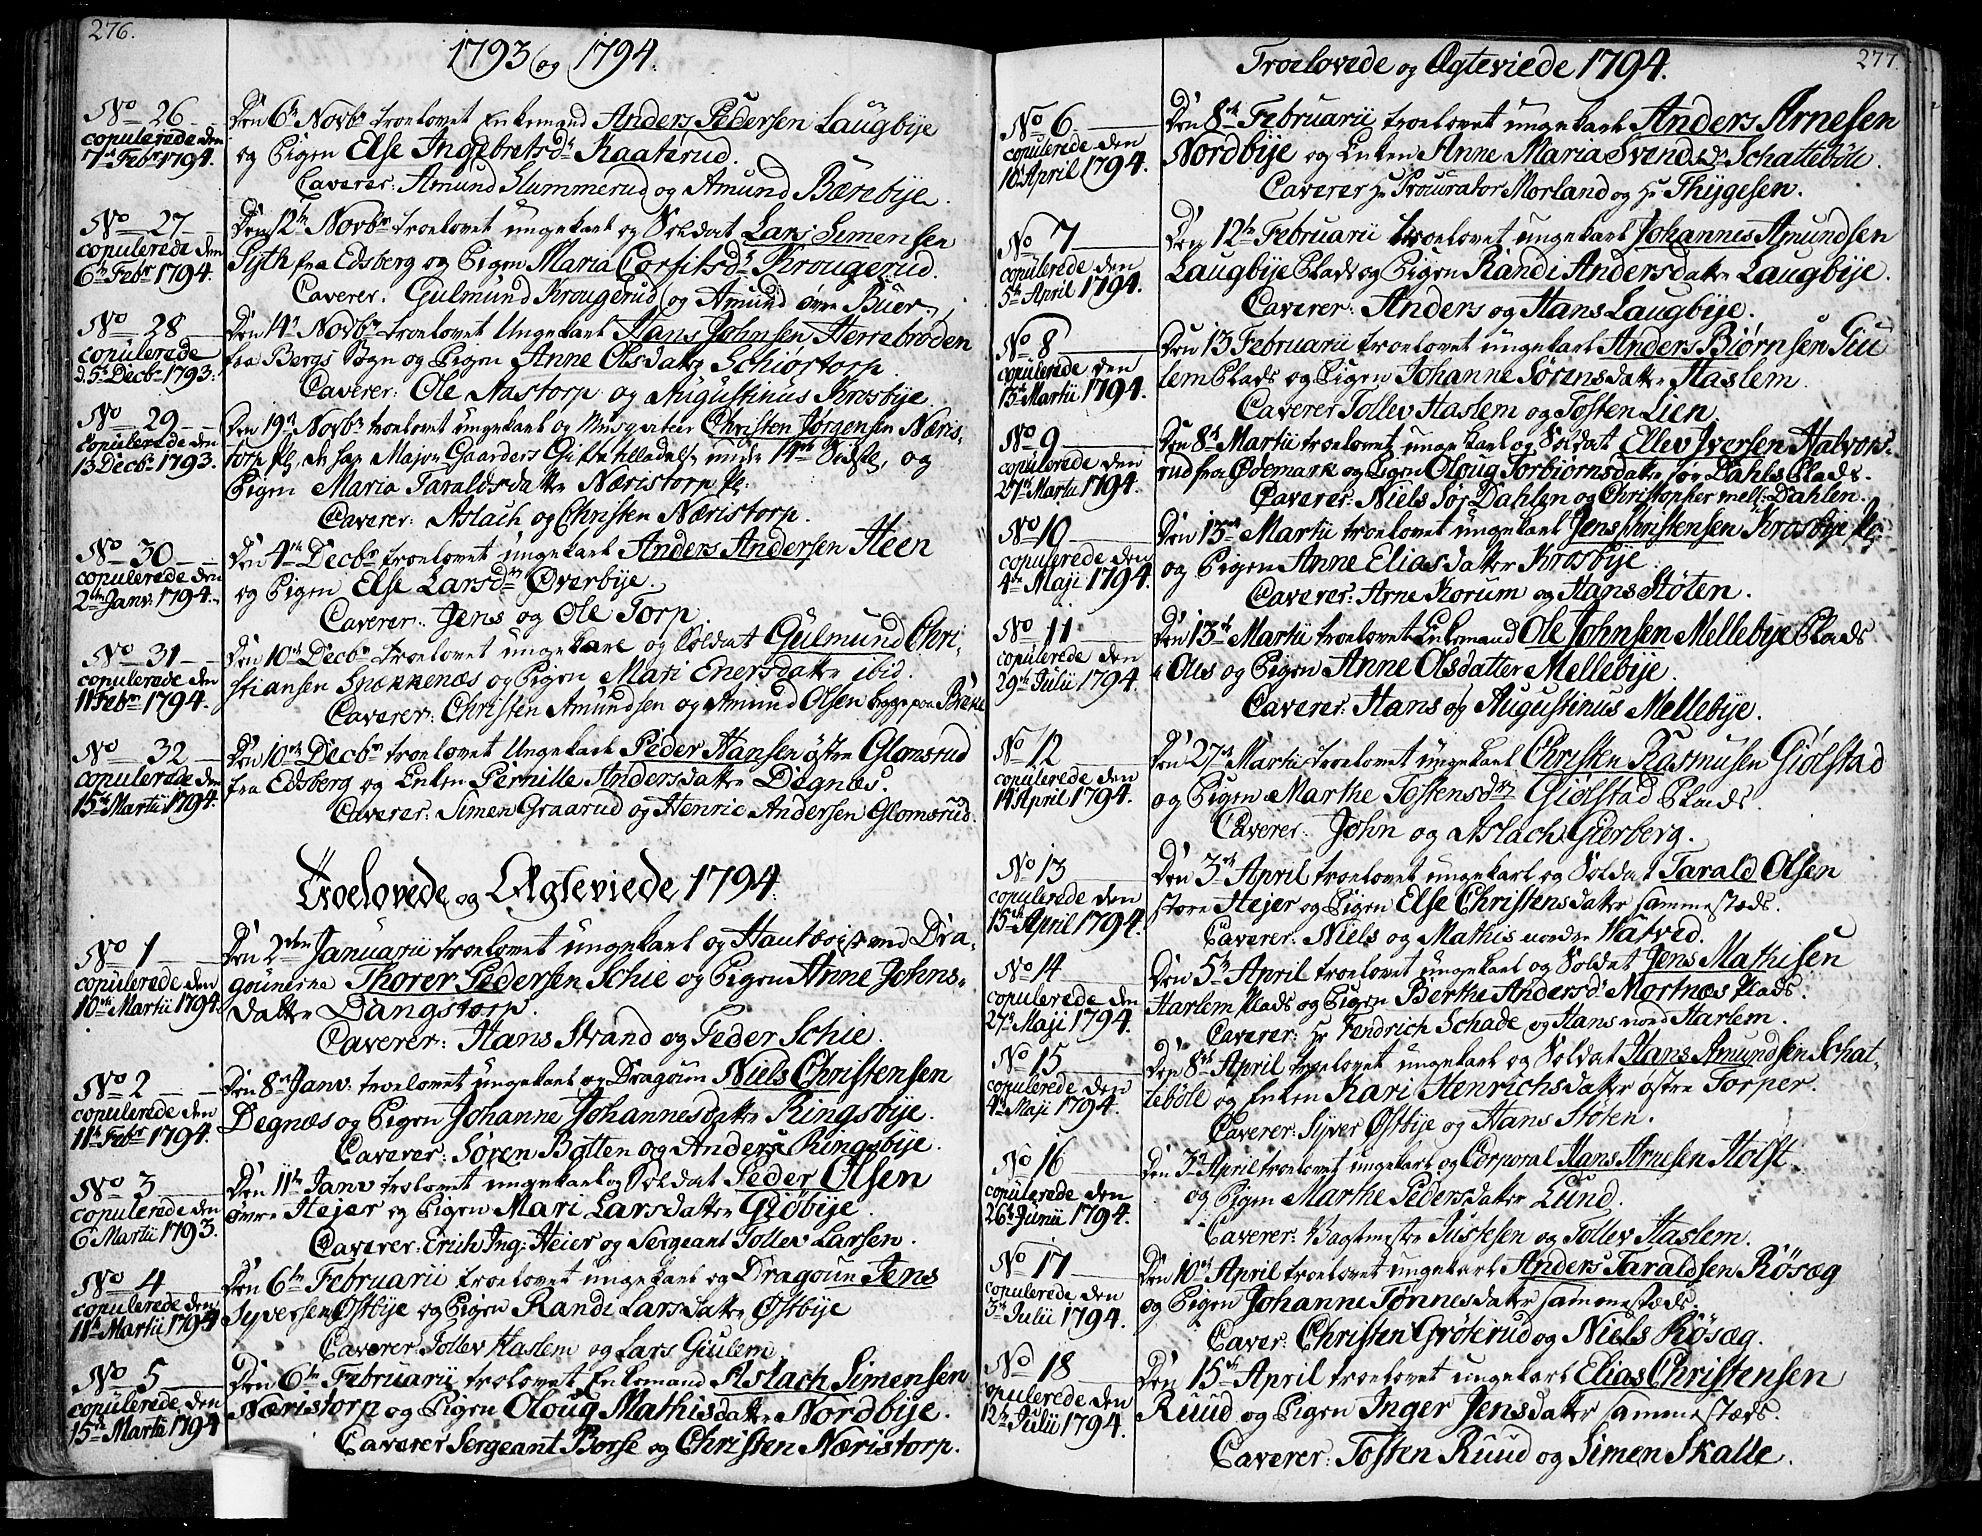 SAO, Rakkestad prestekontor Kirkebøker, F/Fa/L0005: Ministerialbok nr. I 5, 1784-1814, s. 276-277